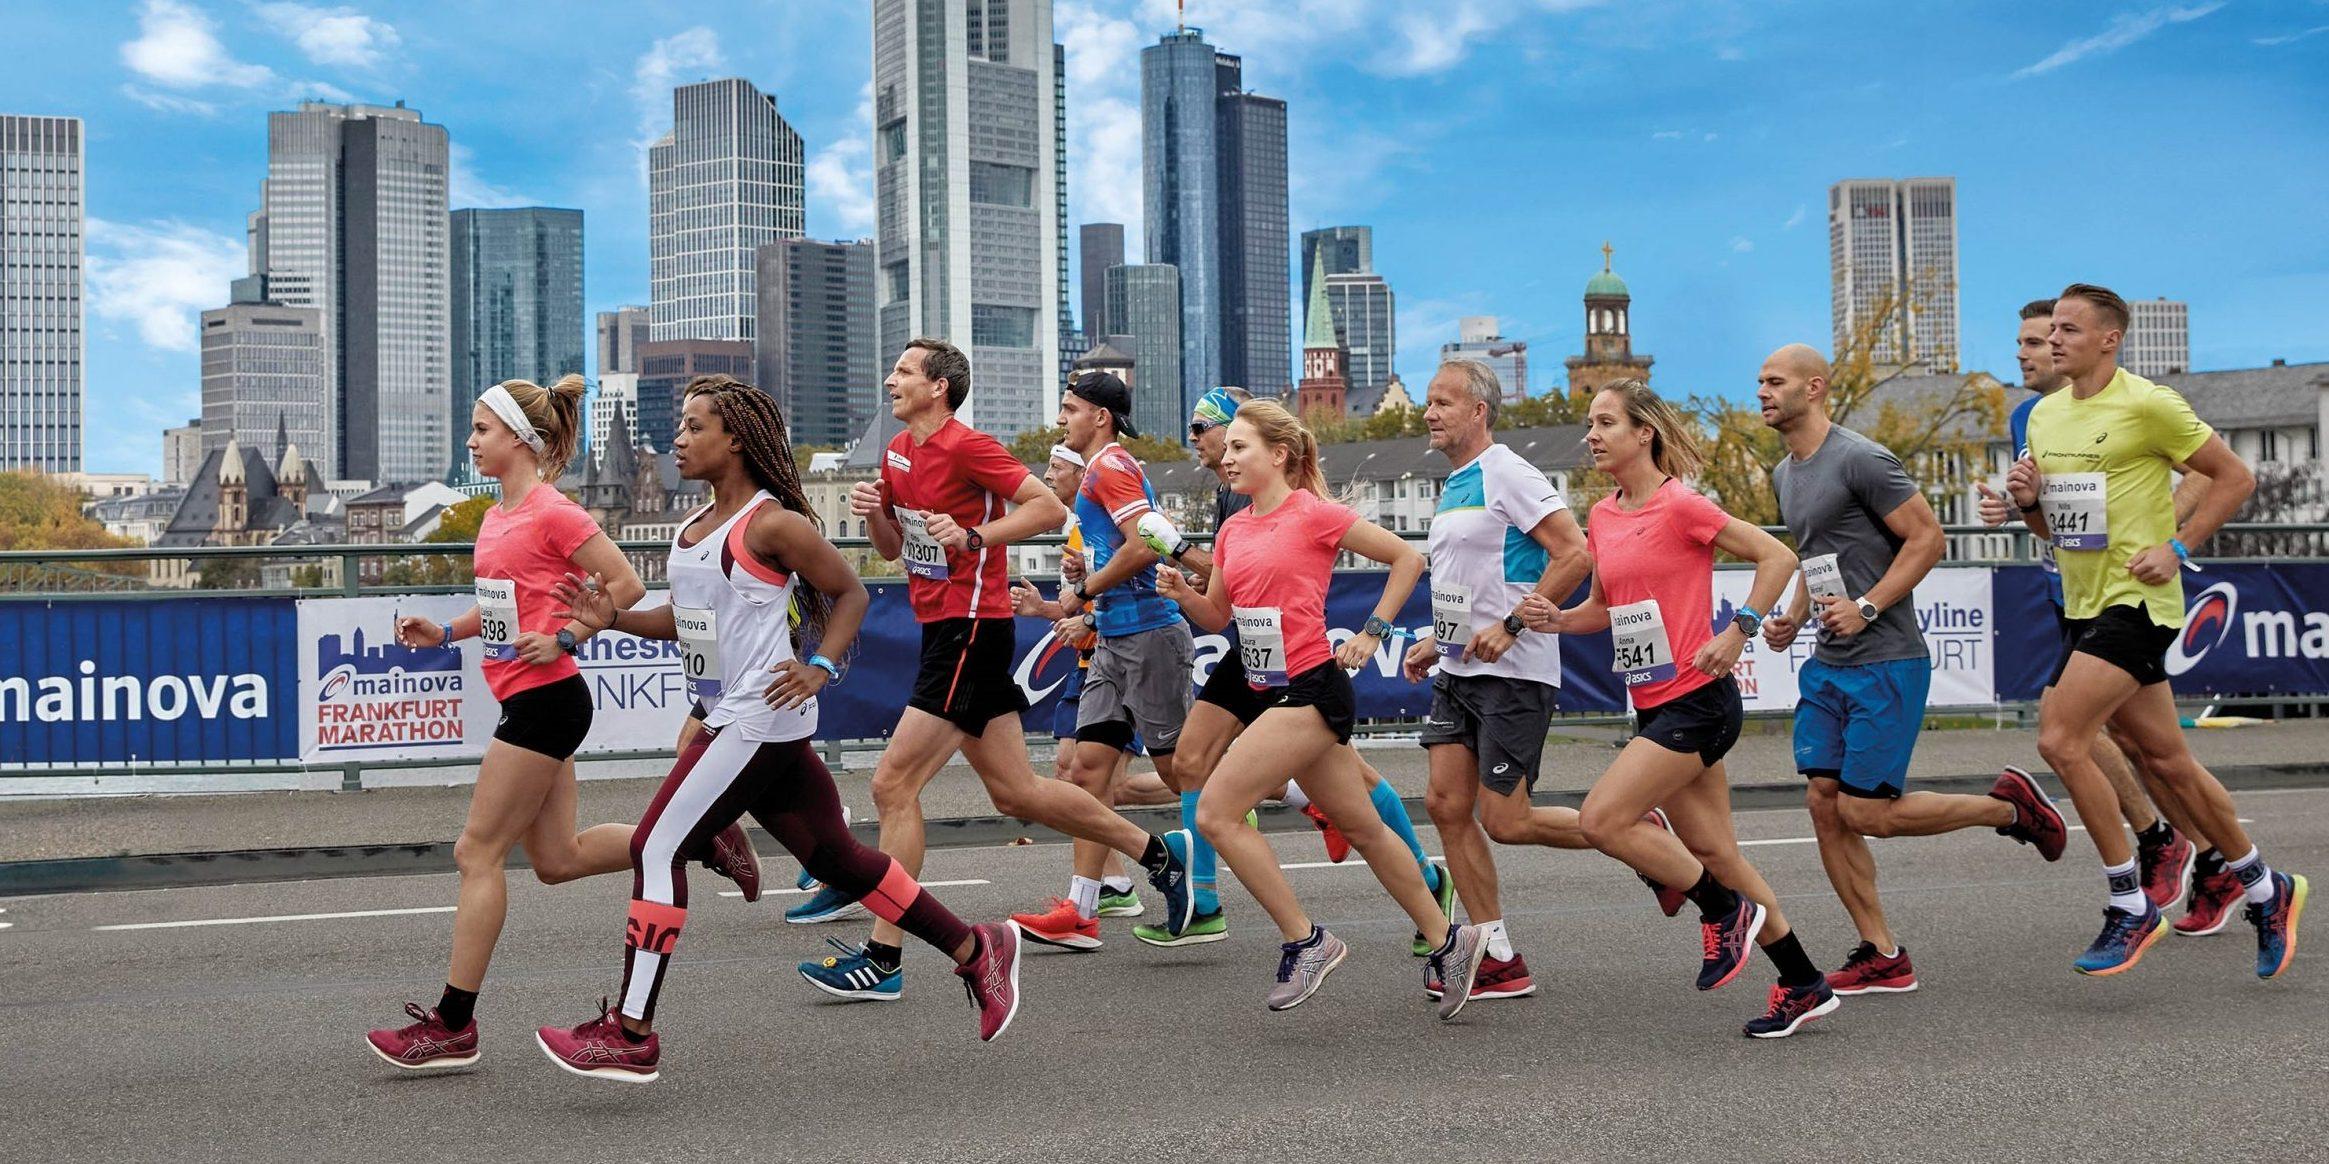 Carreras 5k, 10k, 21k, 42k, ultramaratones, trail running